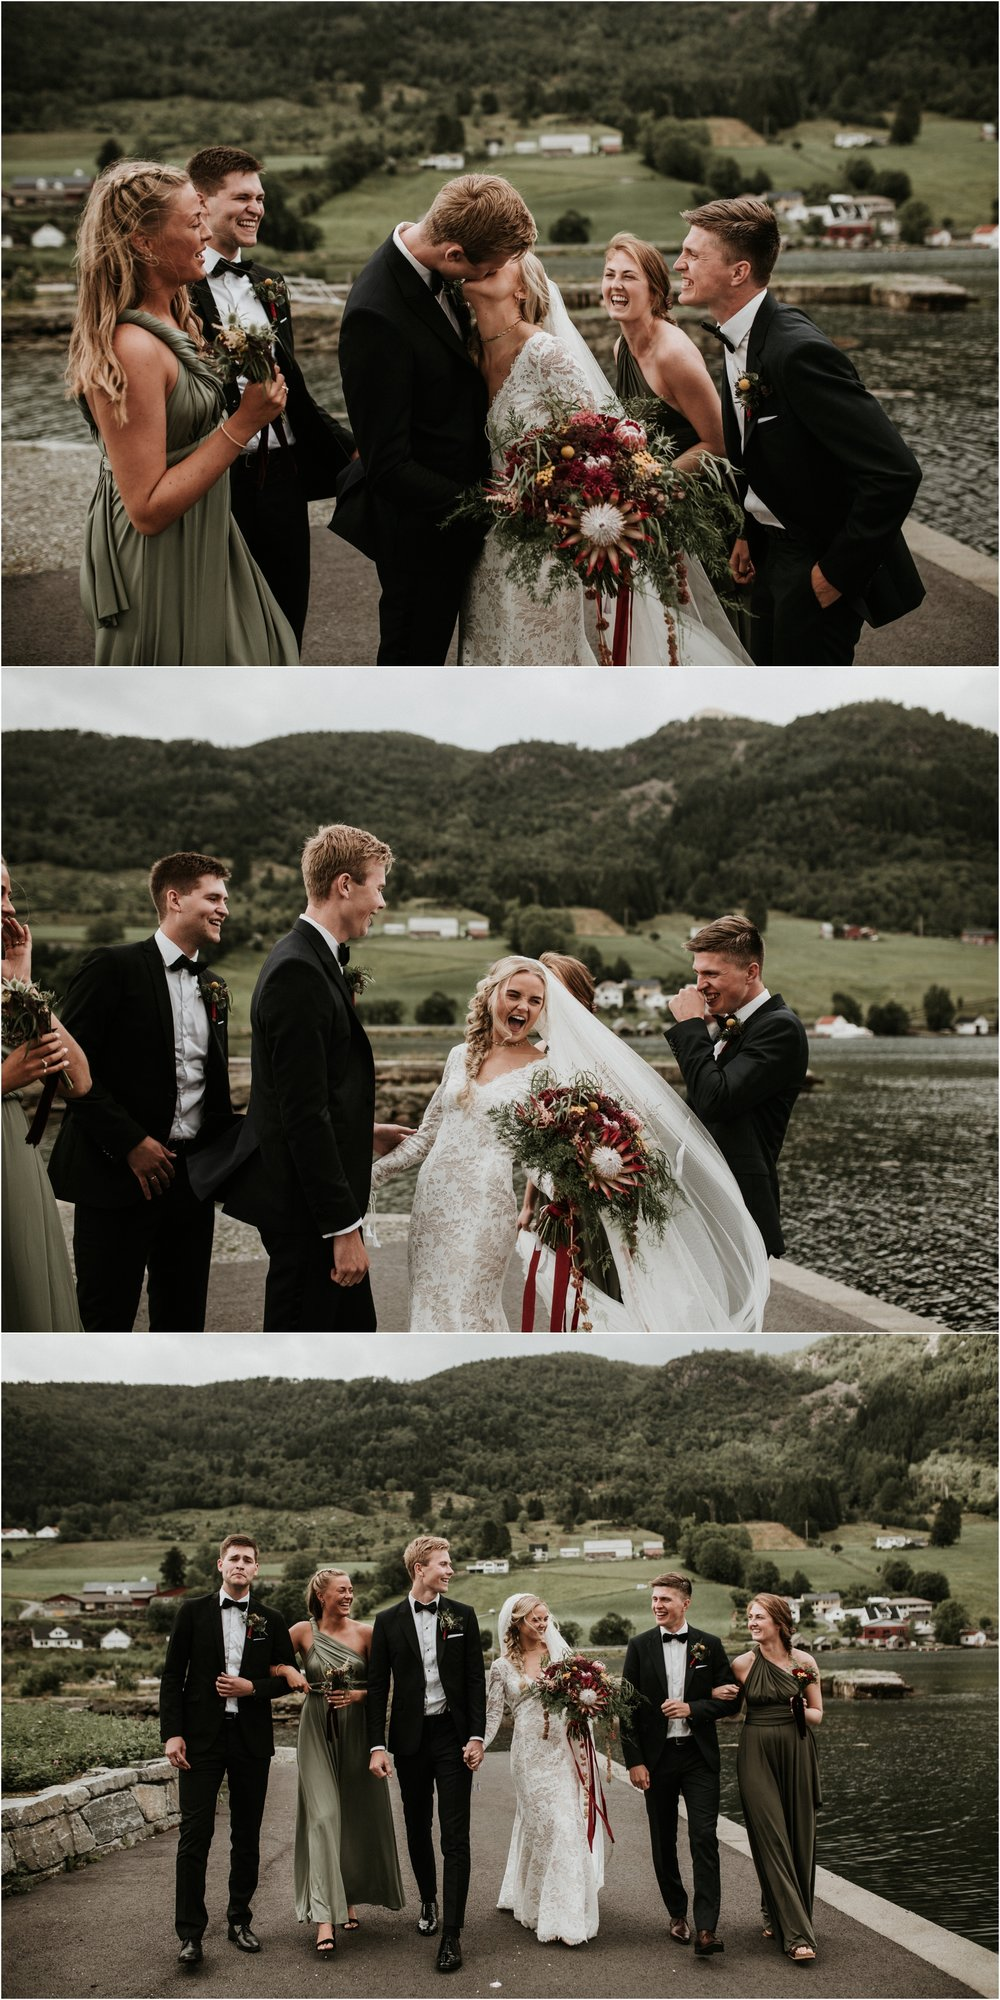 Norway-wedding-photographer-133.jpg